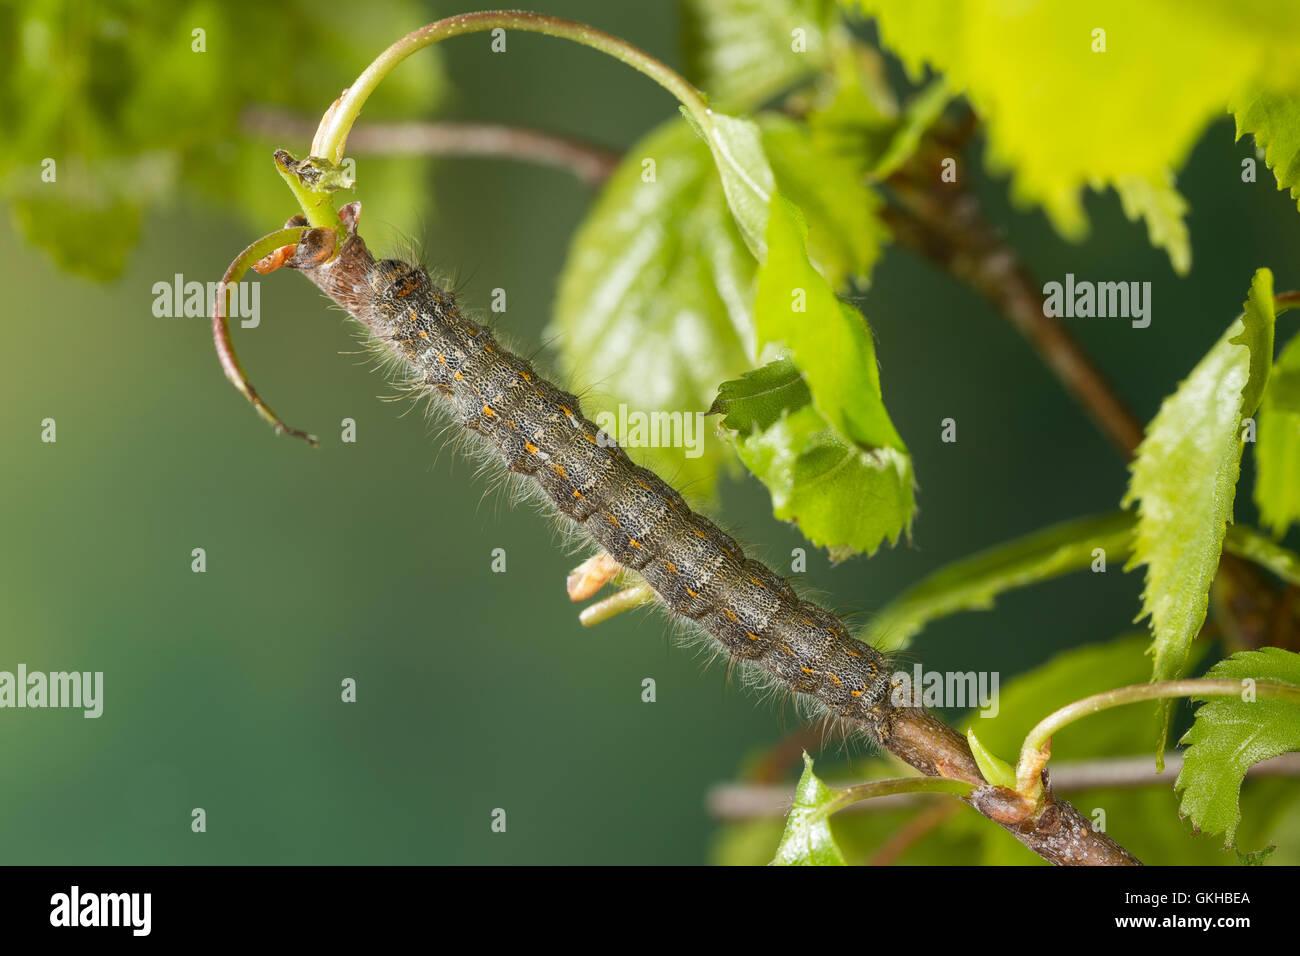 Kleine Pappelglucke, Raupe frist an Birke, Herbstglucke, Poecilocampa populi, December moth, caterpillar, Le Bombyx - Stock Image